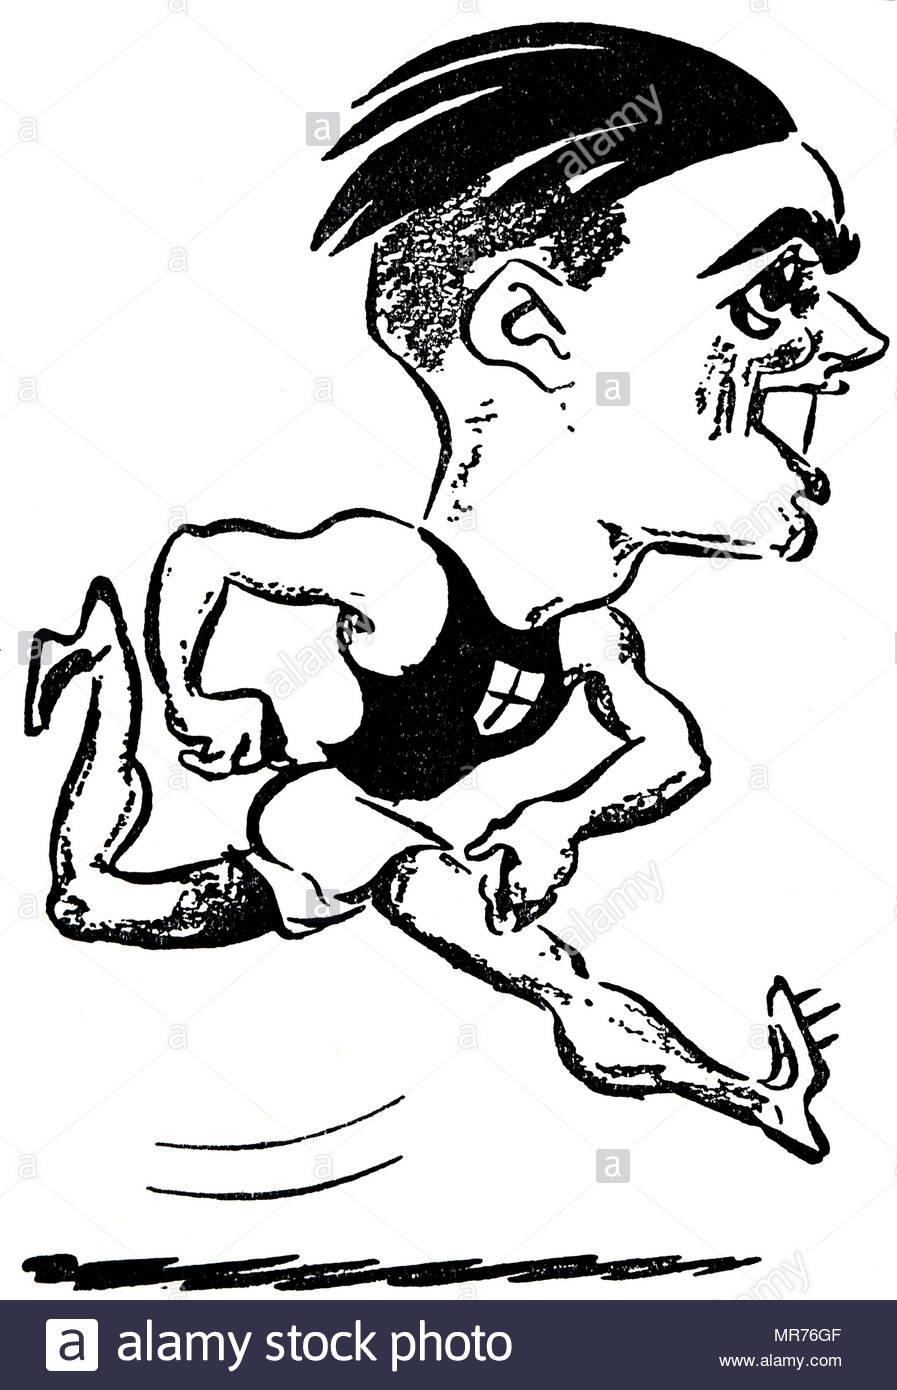 cartoon drawing of a italian athlete luigi beccali during the 1932